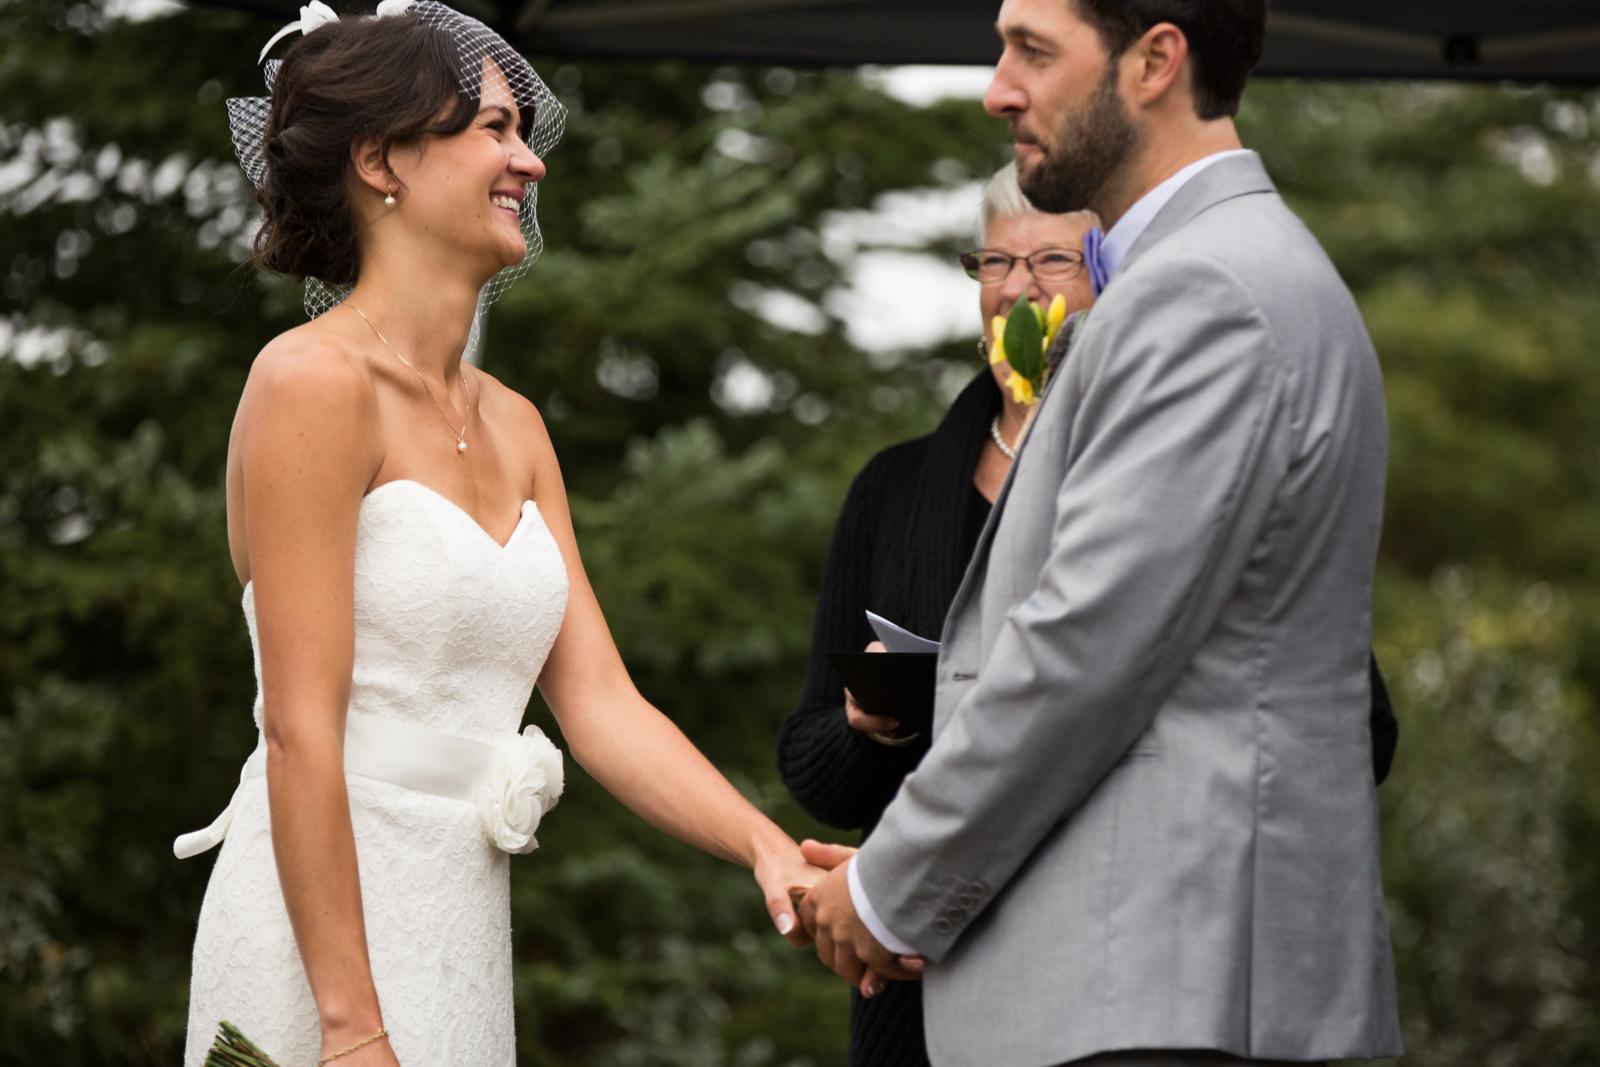 85Willow_and_wolf_Calgary_Wedding Photography-85-70Andrew_Pavlidis_Photography_Silene_and_Sacha_Canmore_Wedding-4262